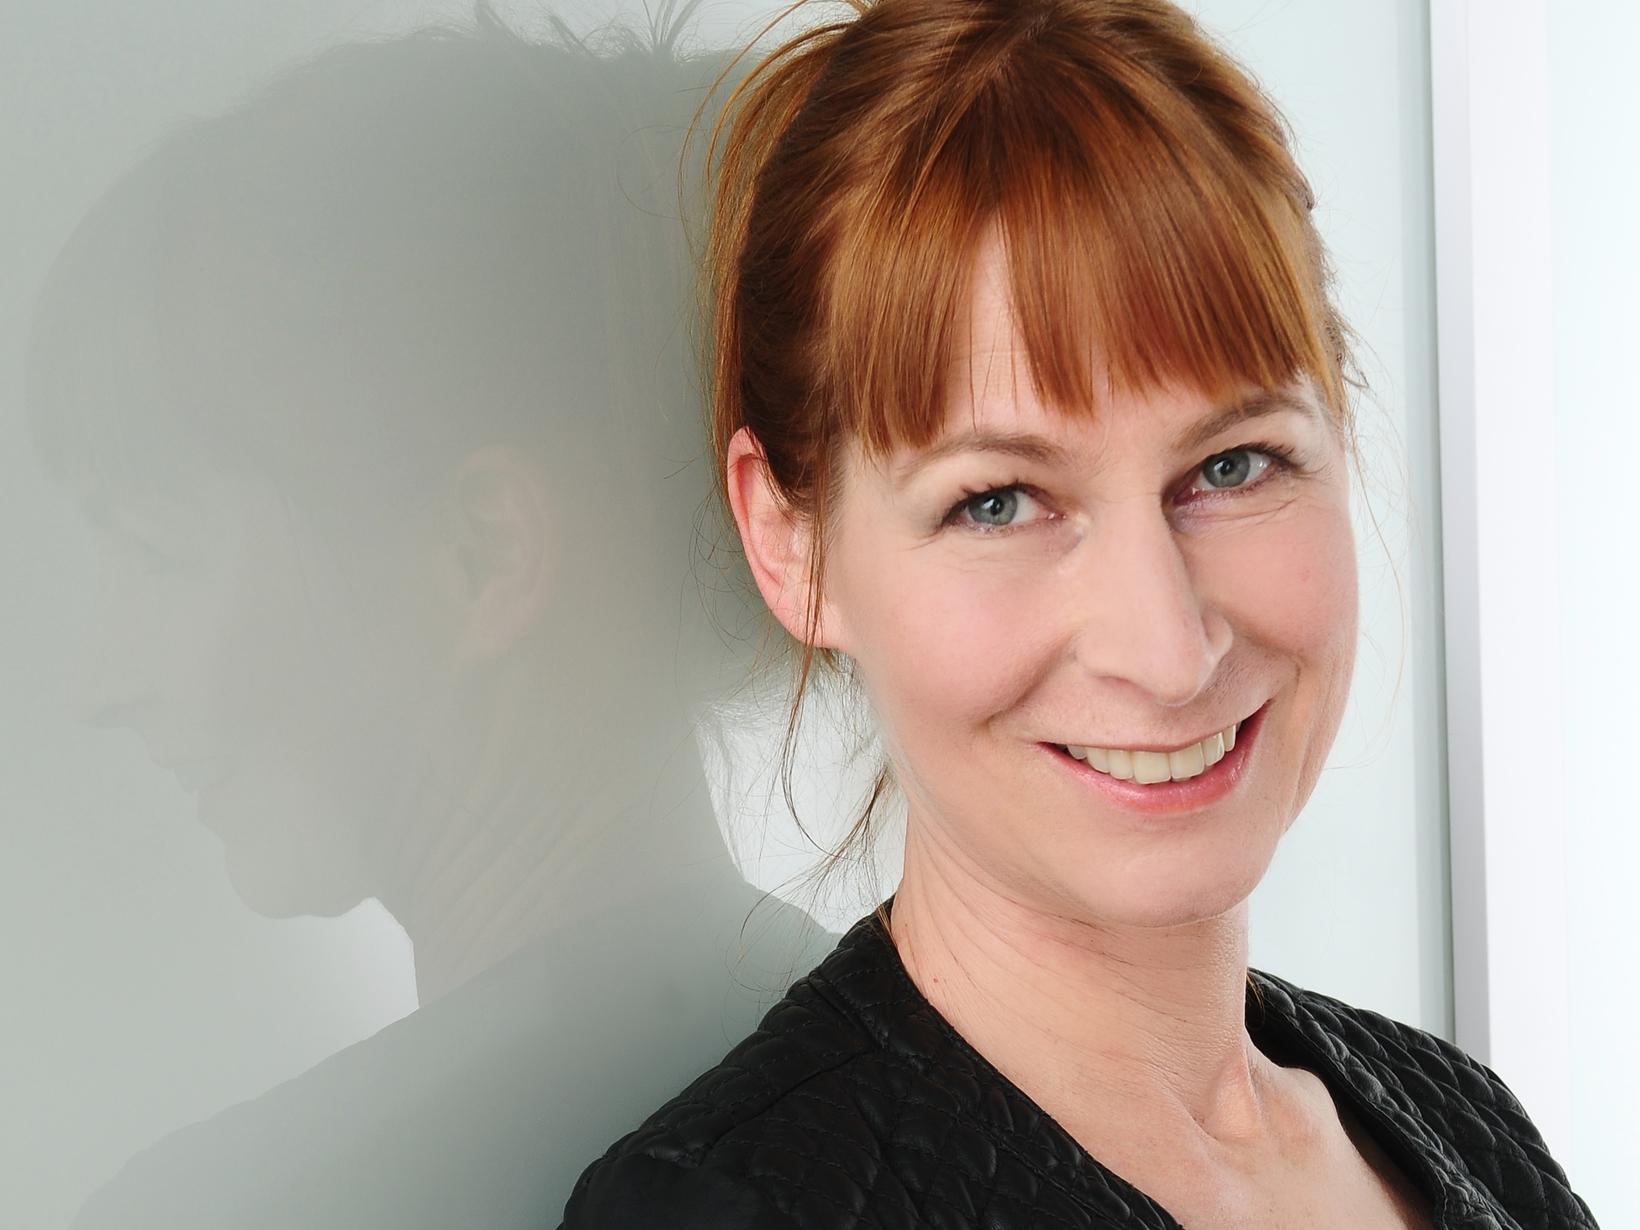 Monika from Augsburg, Germany